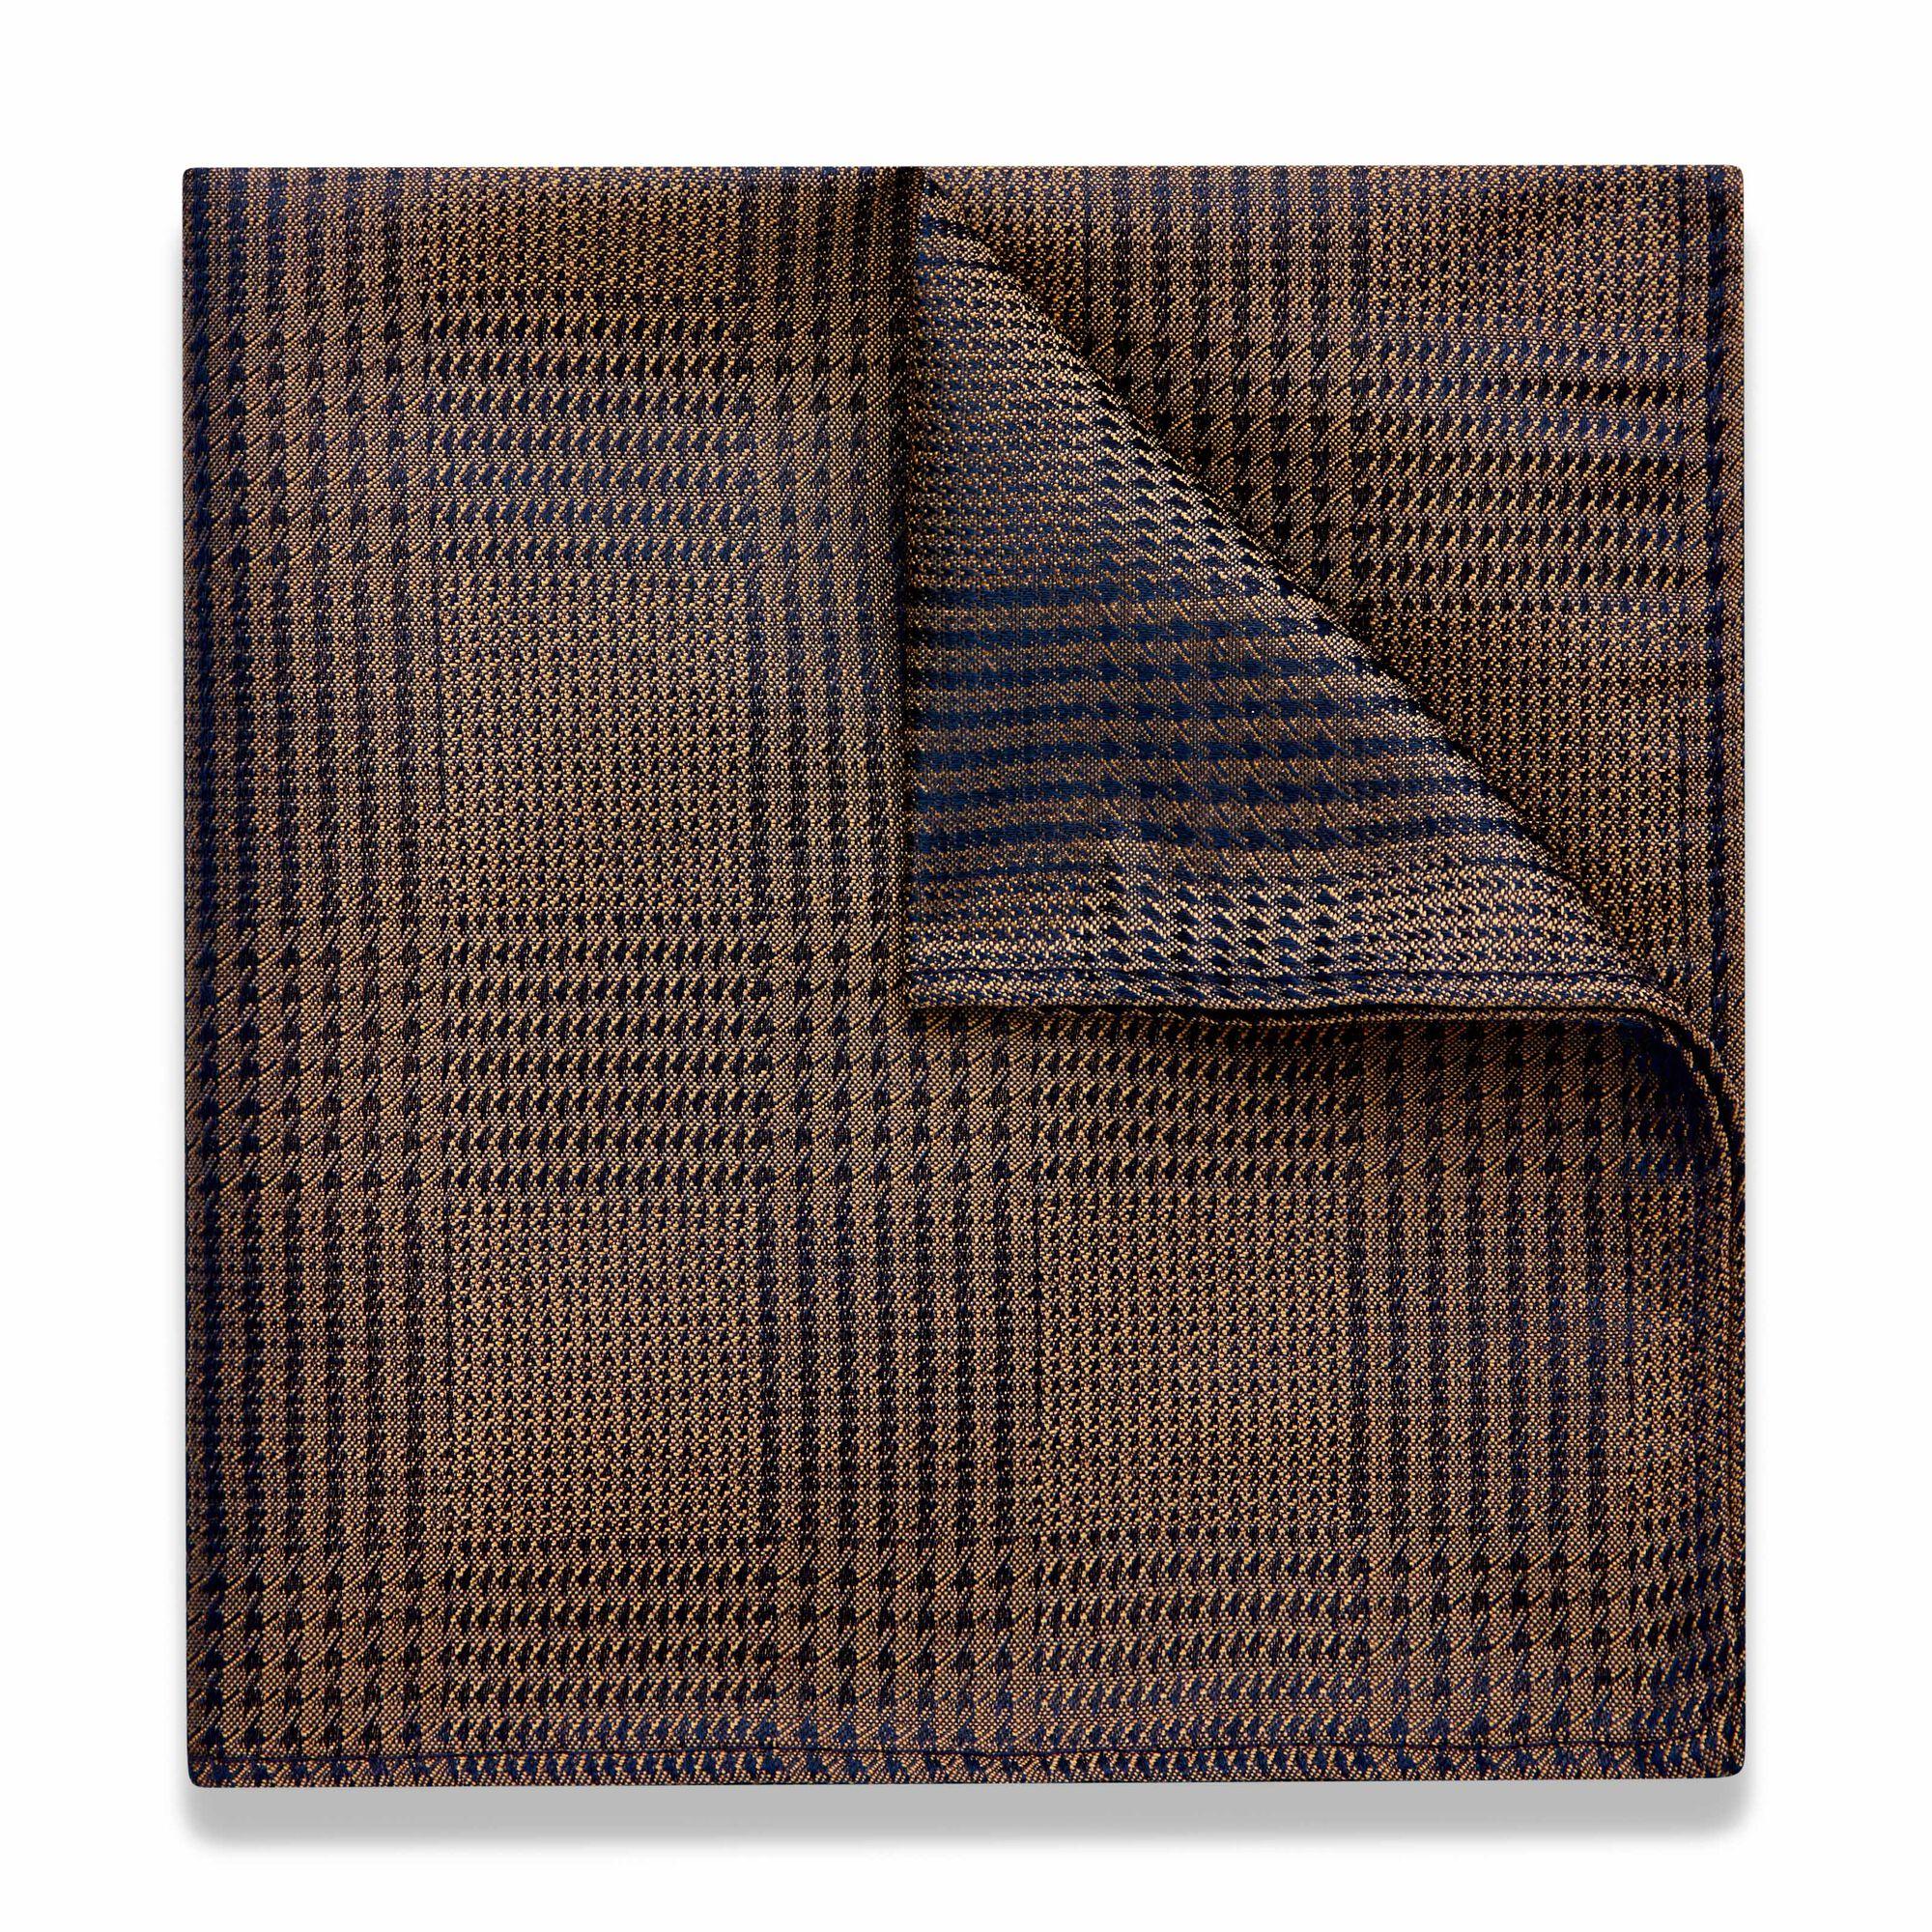 25b673193284c Narius - Gold - Two Tone Check Pocket Square | Politix